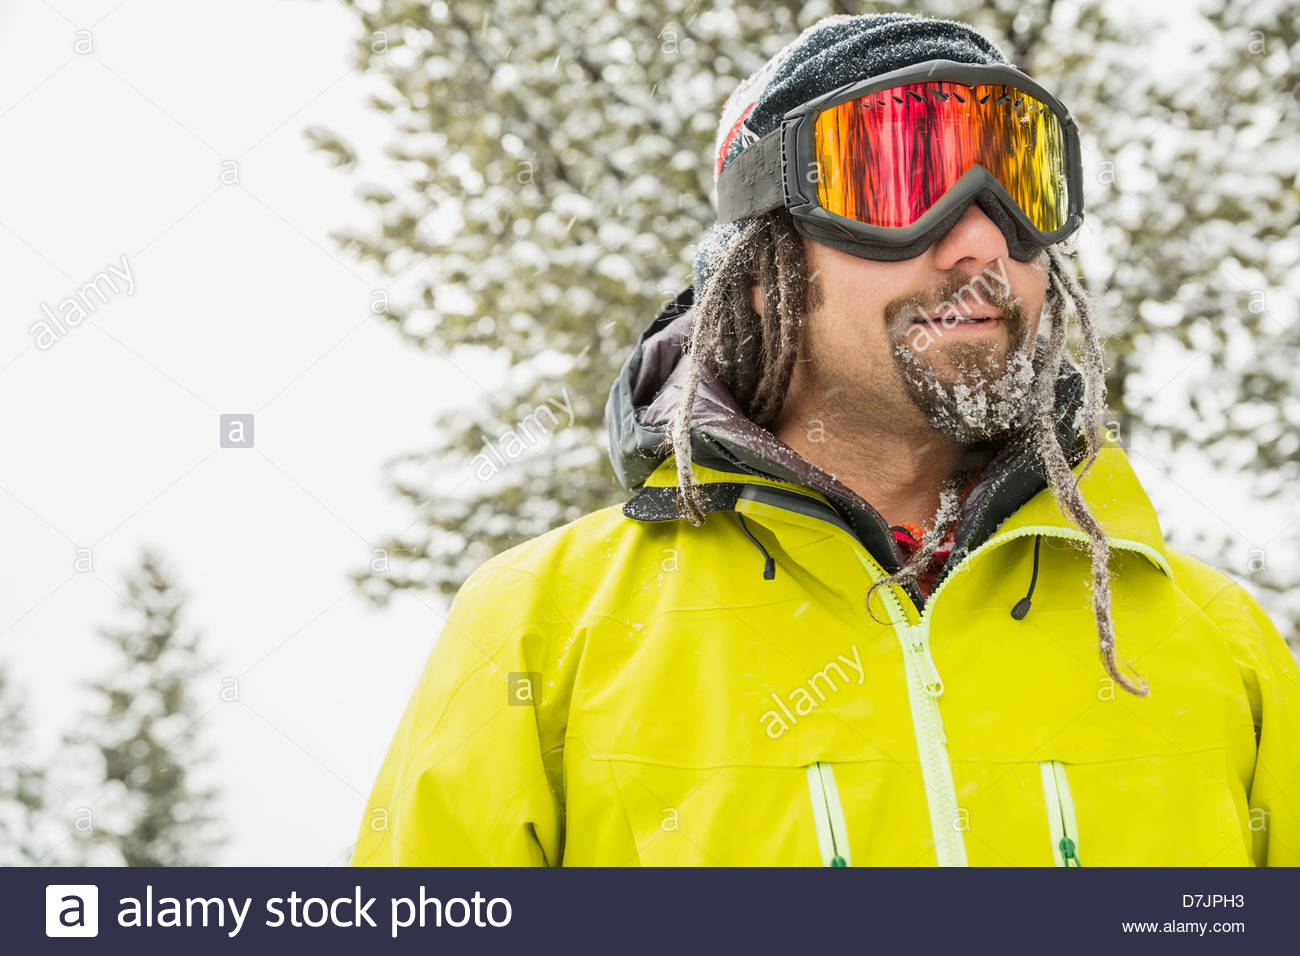 Man wearing ski goggles in winter - Stock Image